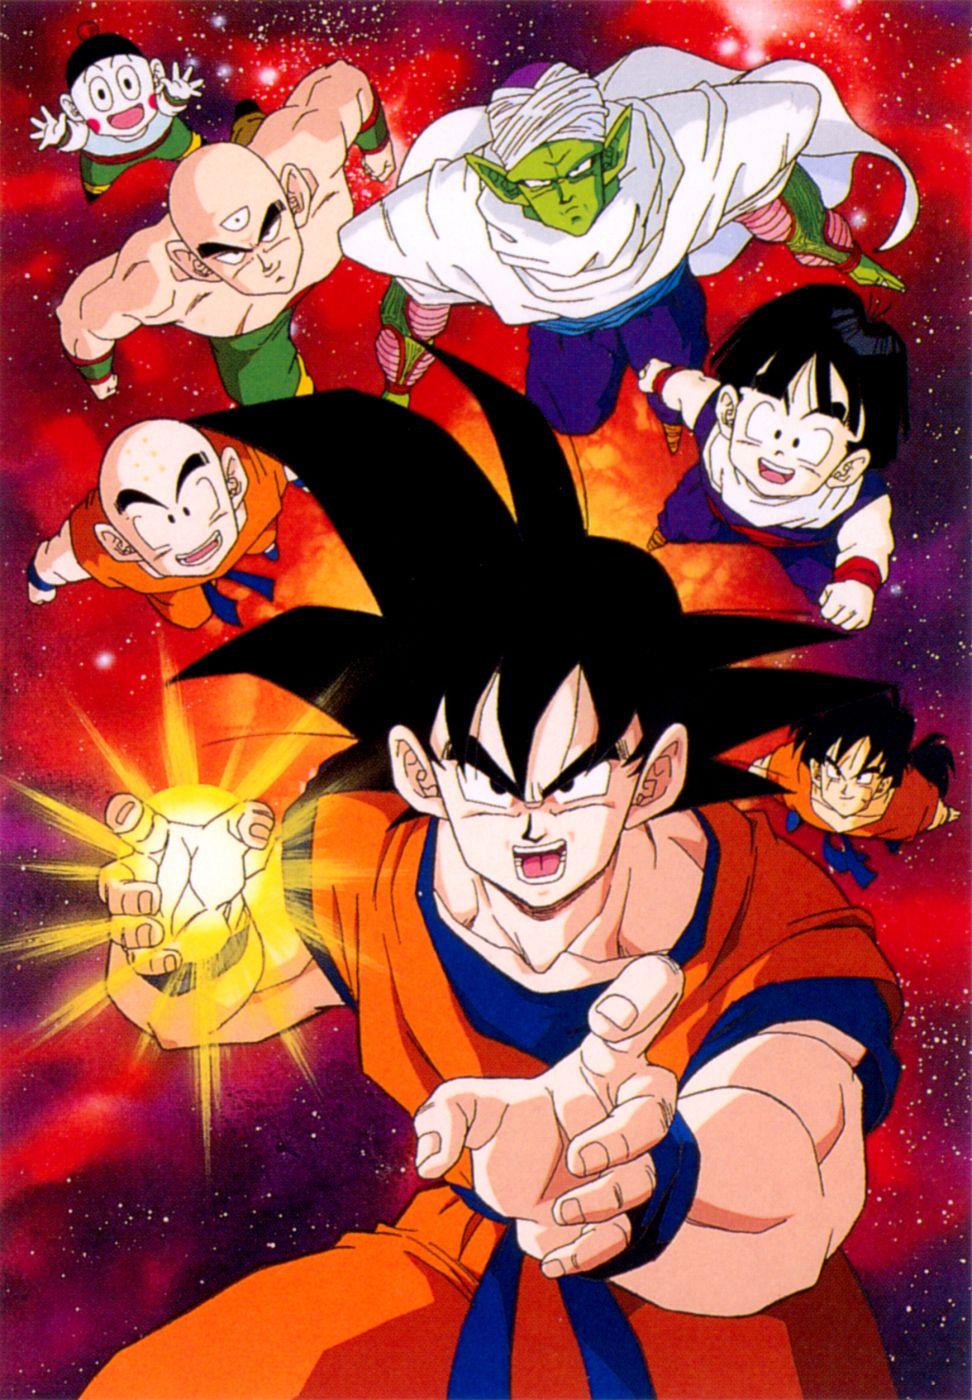 Goku Gohan Yamcha Krillin Chiaotzu Tien And Piccolo Personajes De Dragon Ball Dragones Dibujos